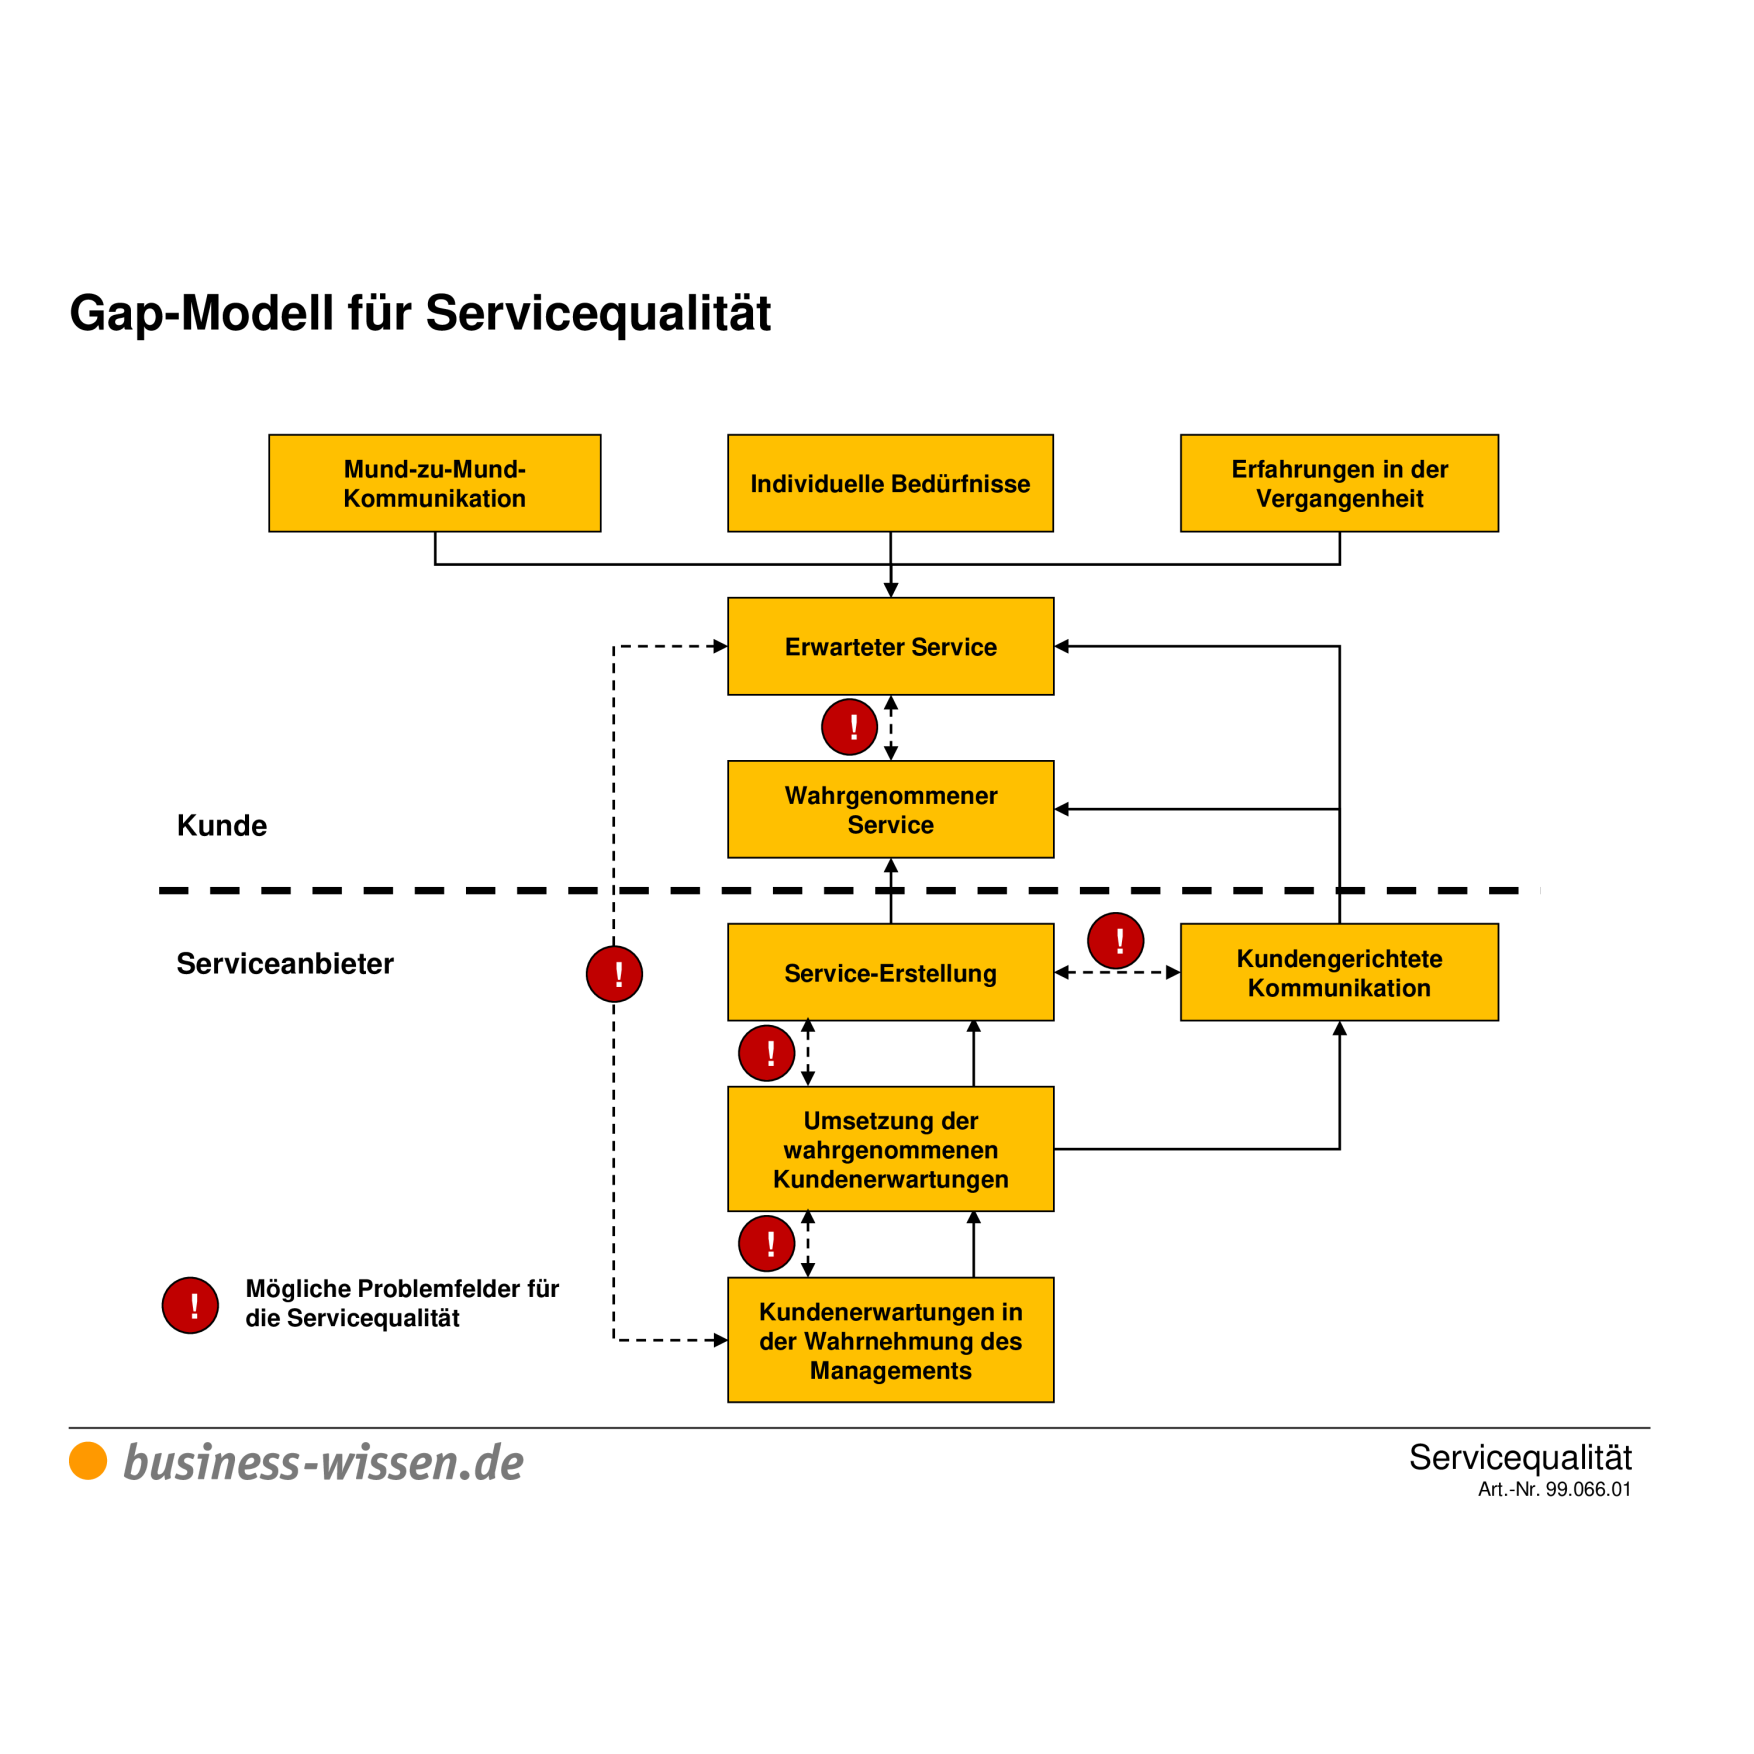 Gap Modell Fur Servicequalitat Vorlage Business Wissen De